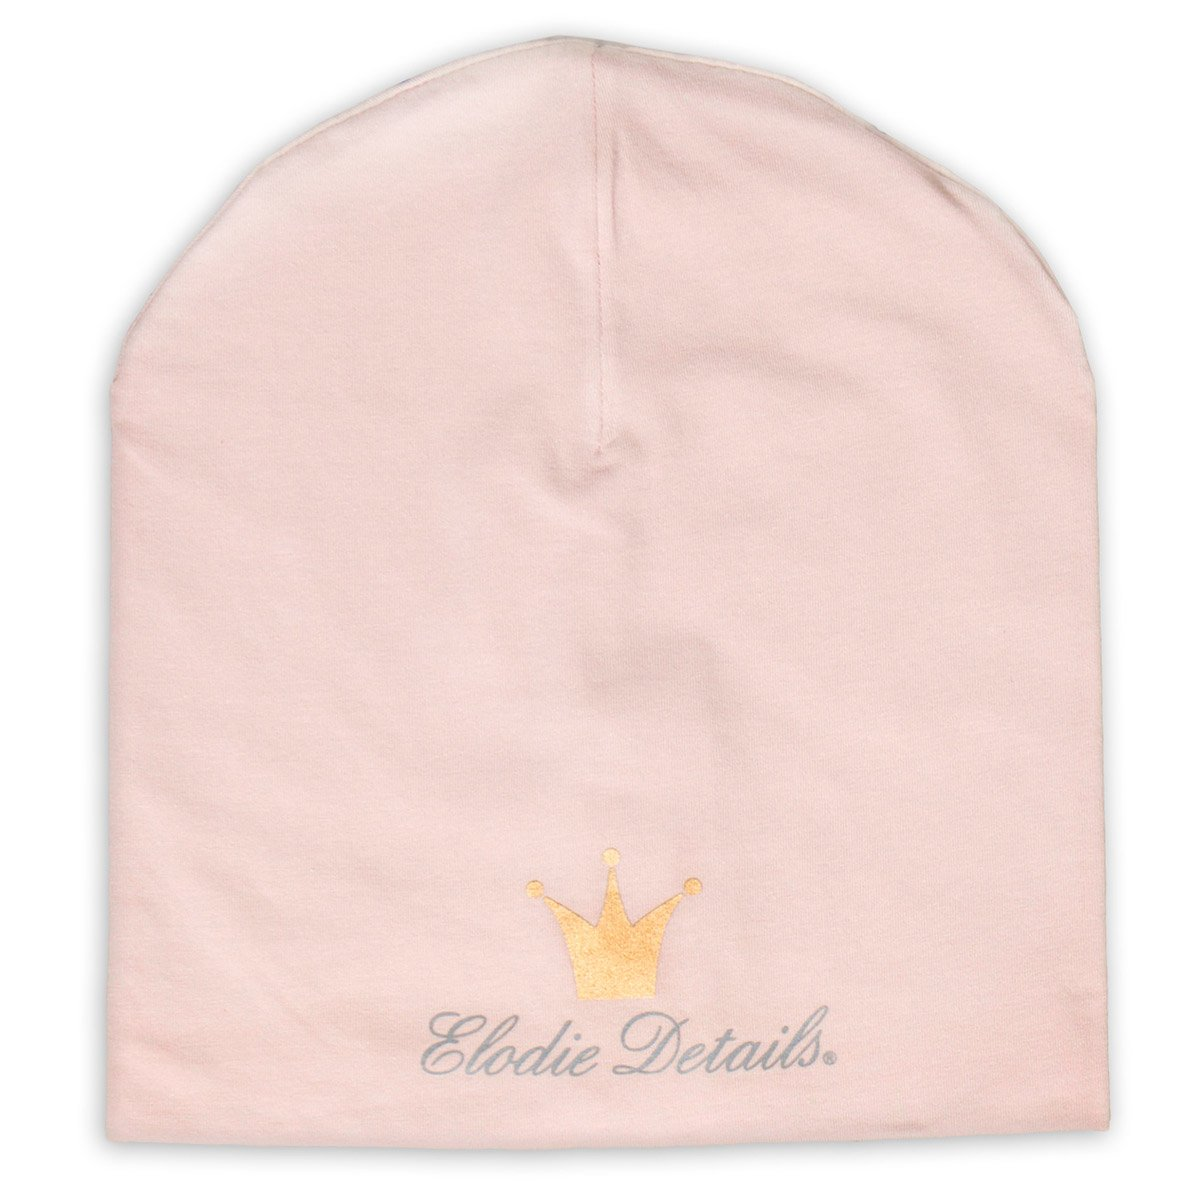 Elodie Details Logo Beanie (24–36meses, Powder Pink) ELODIELGBEANPOWPNK24-36M